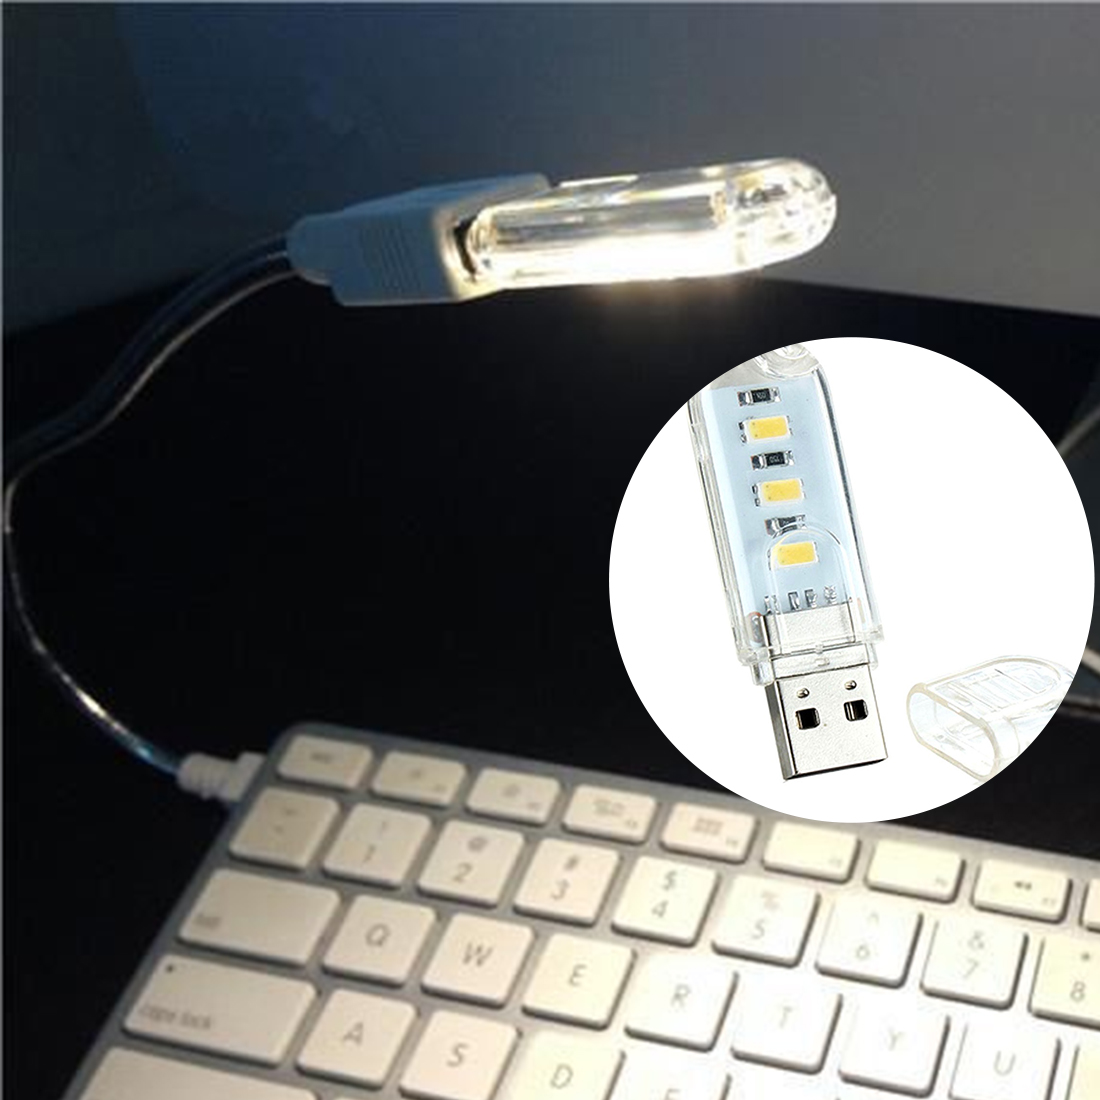 Hearty 10pcs Black Led Lamp Bulb Keychain Pocket Card Mini Led Night Light Portable Usb Power Integrated Circuits